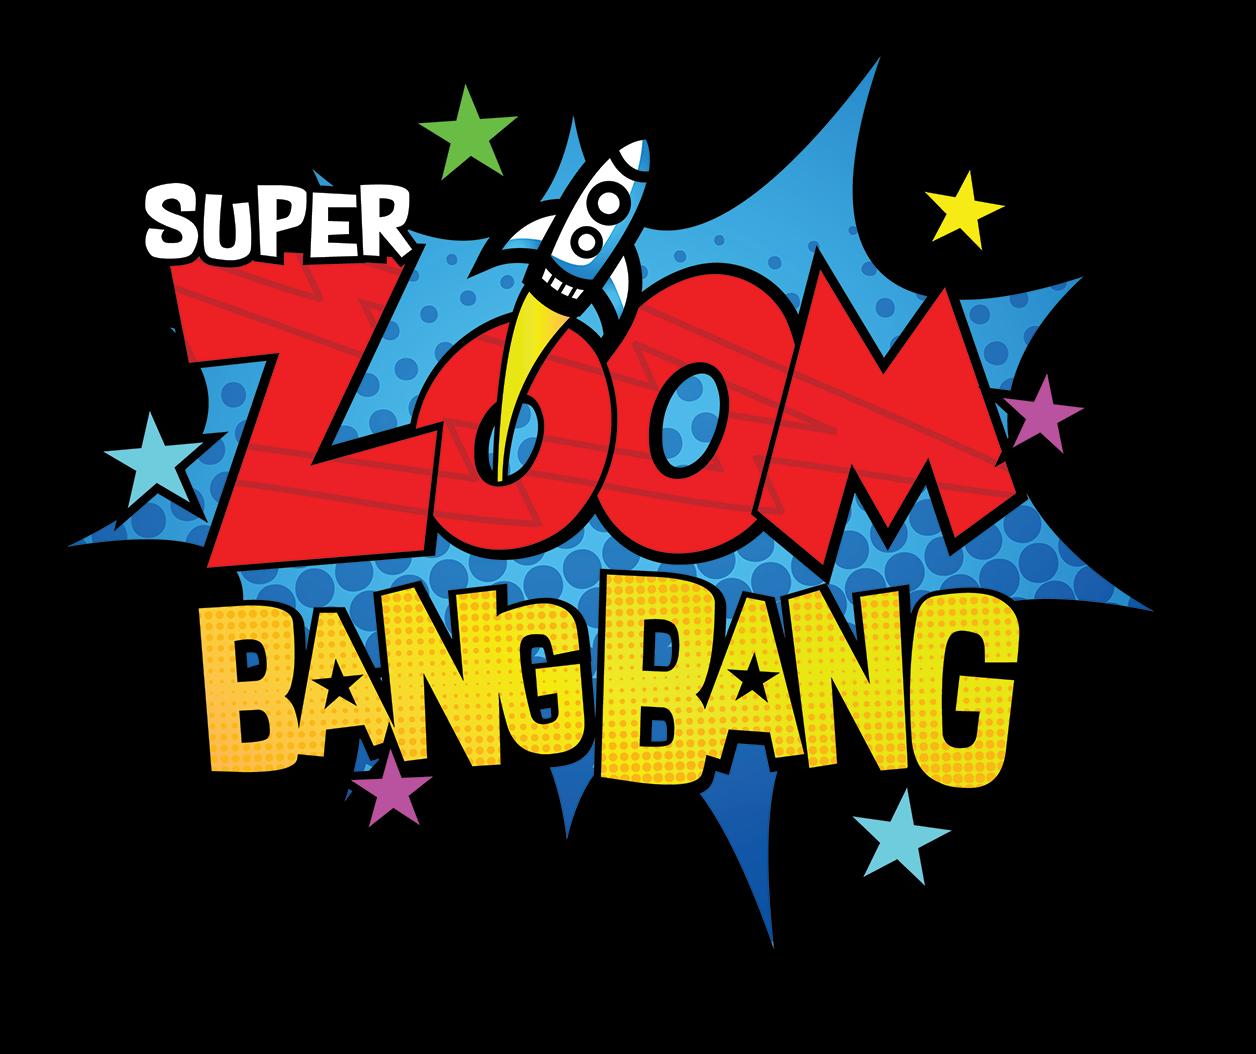 Download Hd Zoom Logo Png Transparent Png Image Nicepng Com